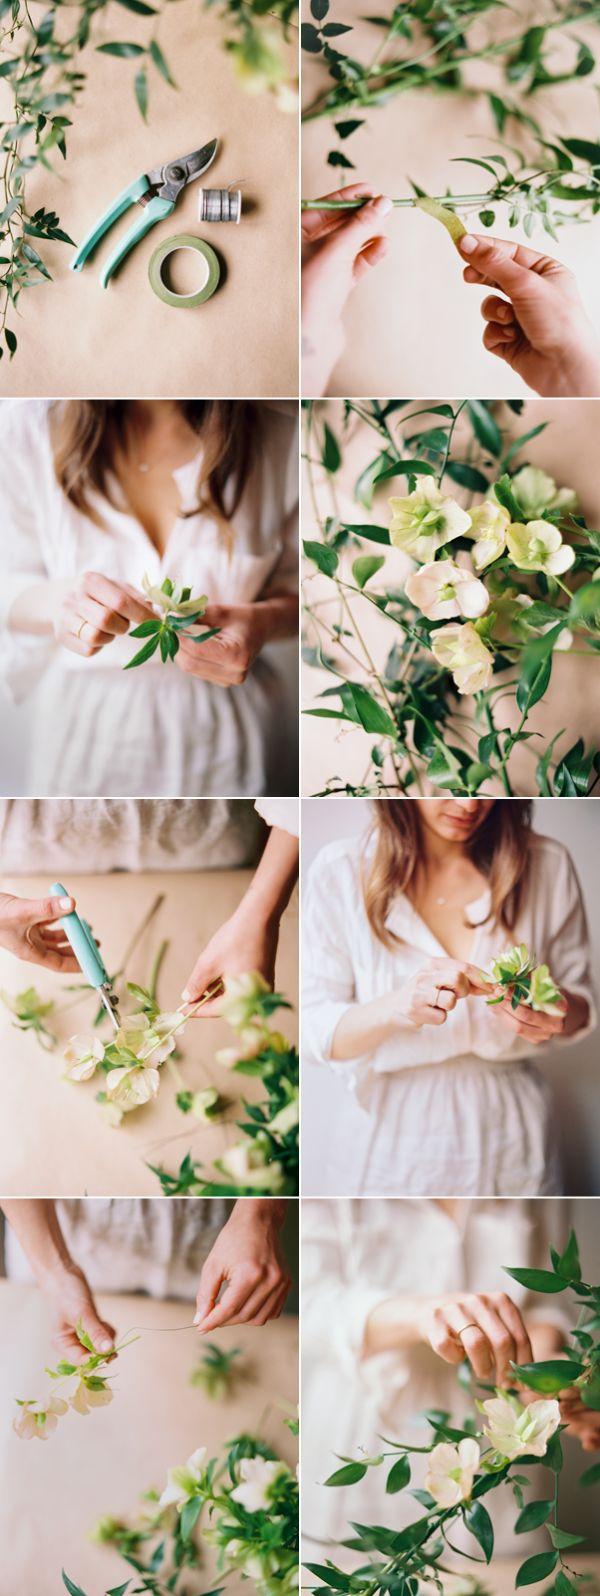 DIY Spring Wedding Garland via oncewed.com